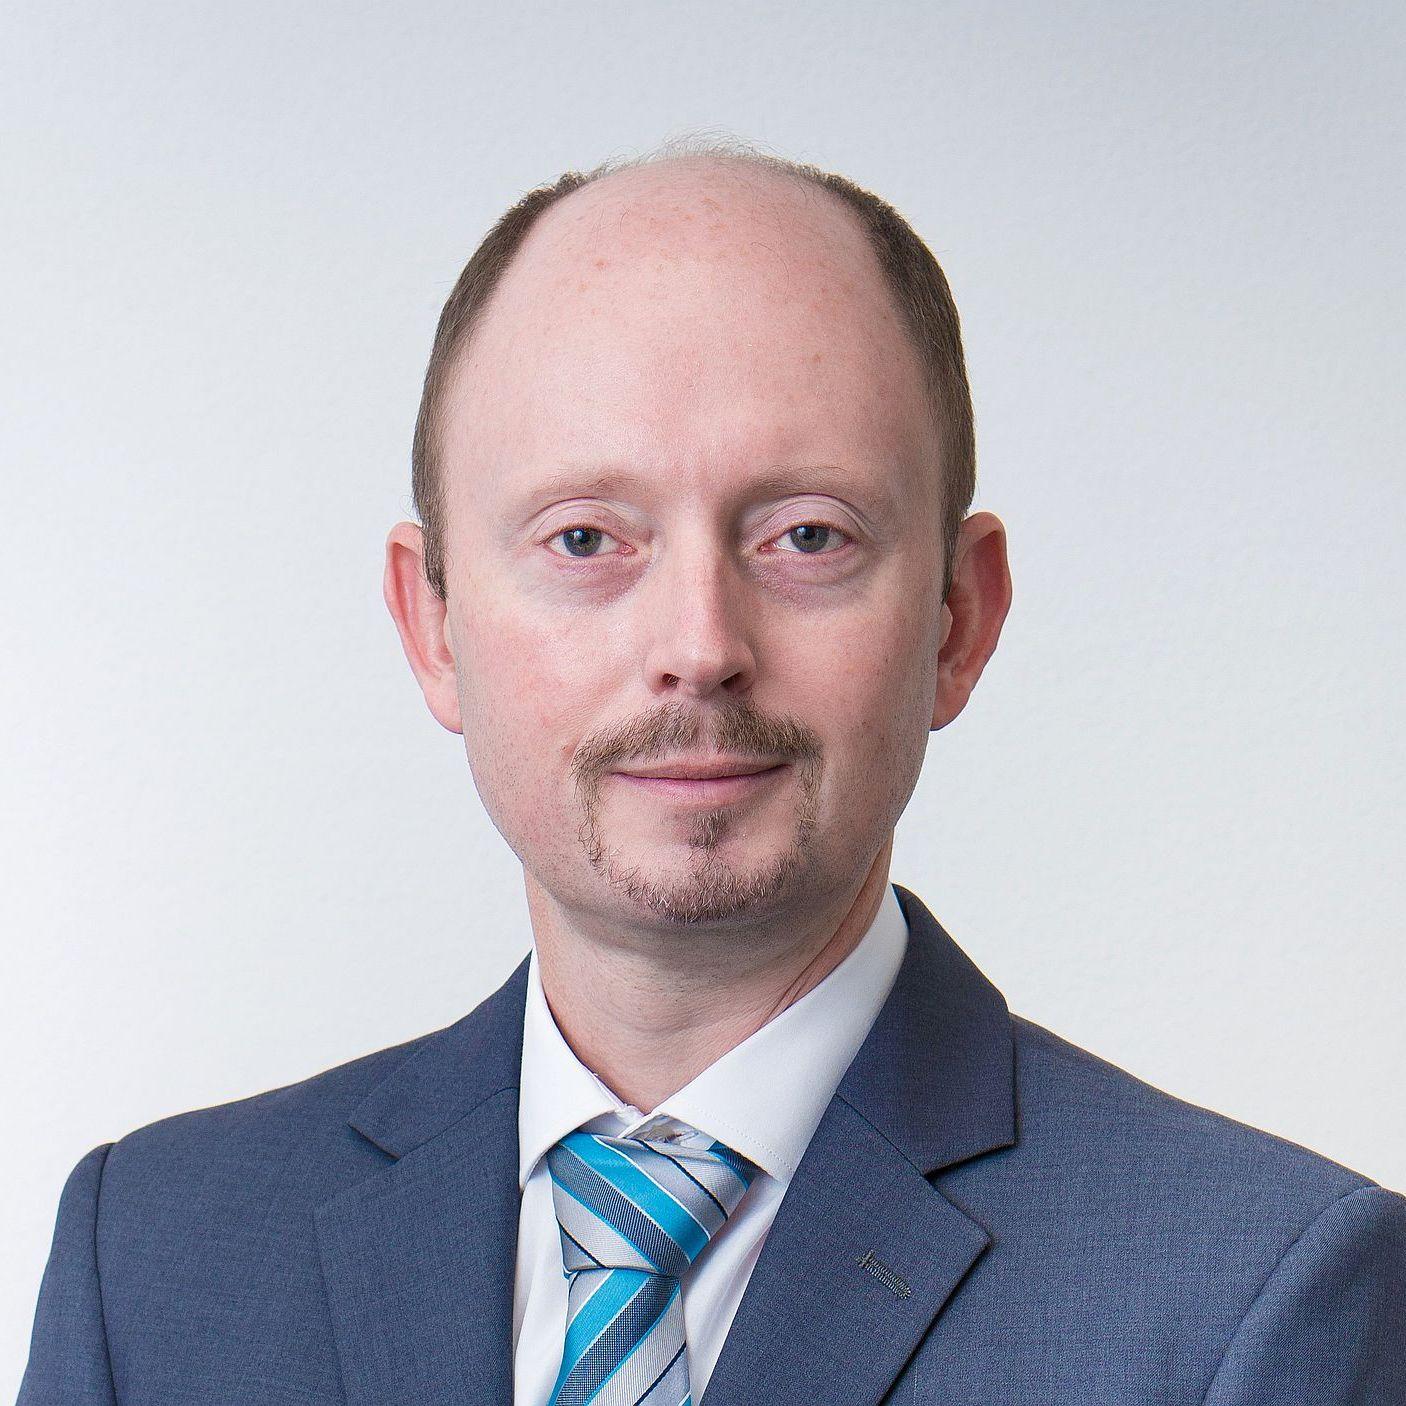 Pavel Rieder